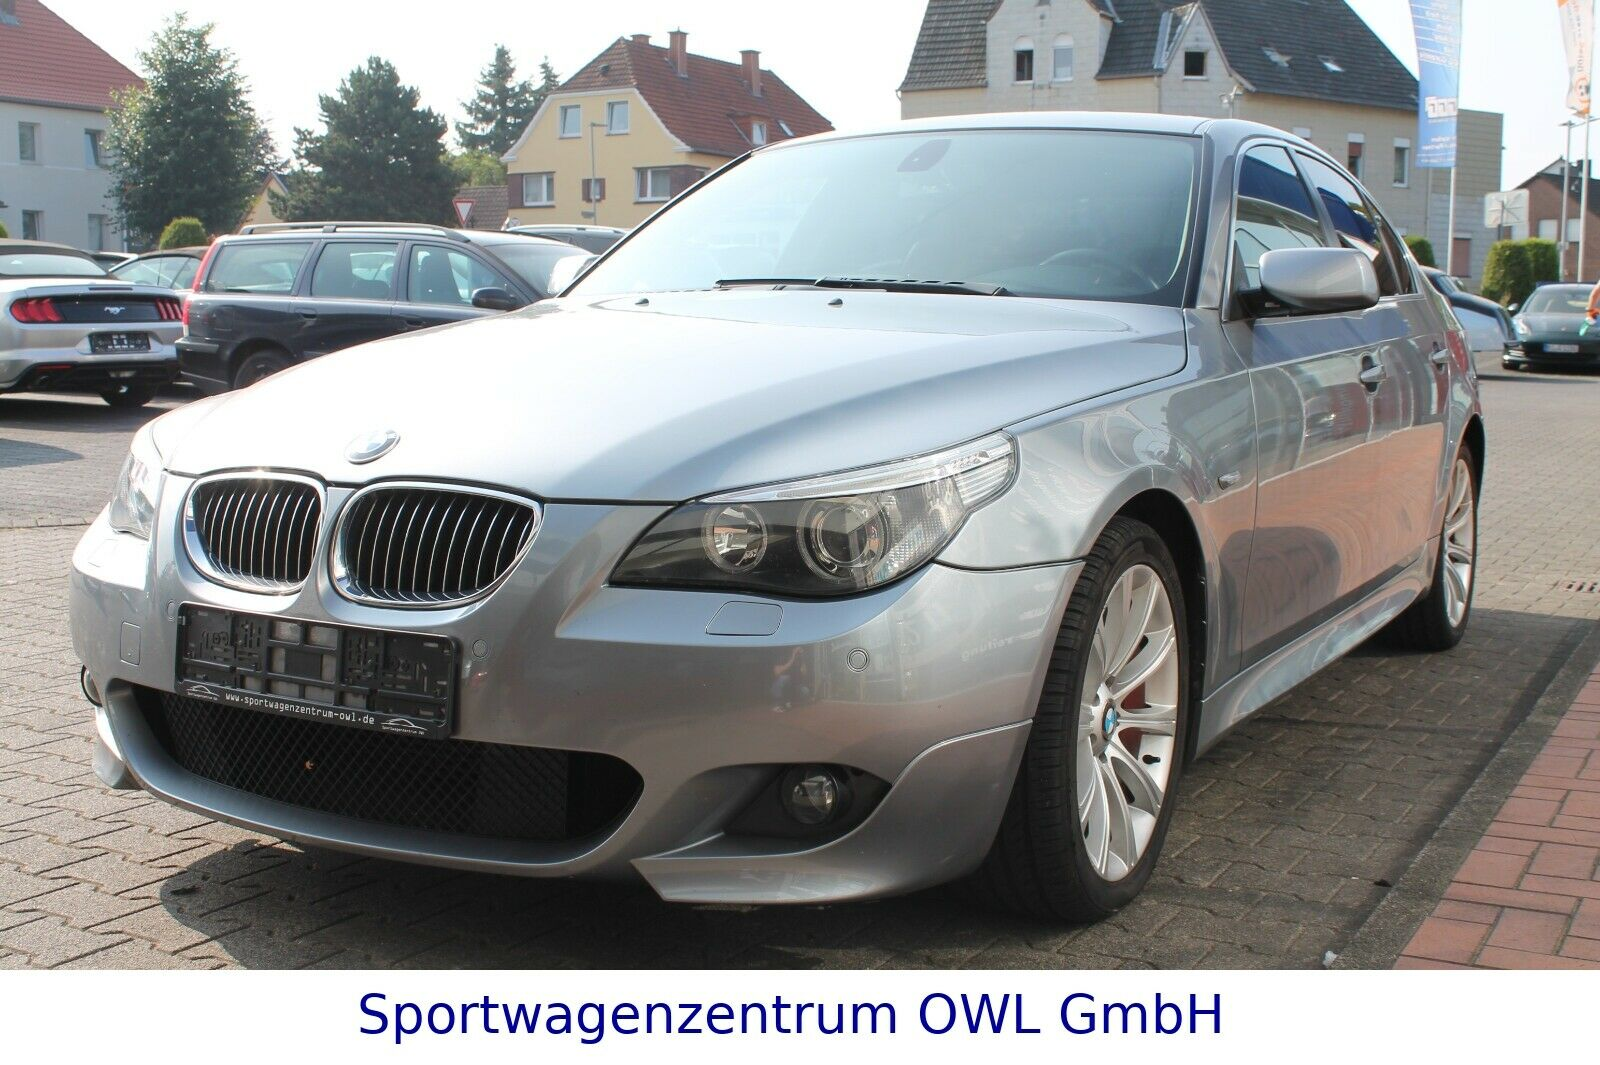 BMW Baureihe 5 Lim. 530d*RDKS*M-Paket*Navigation*